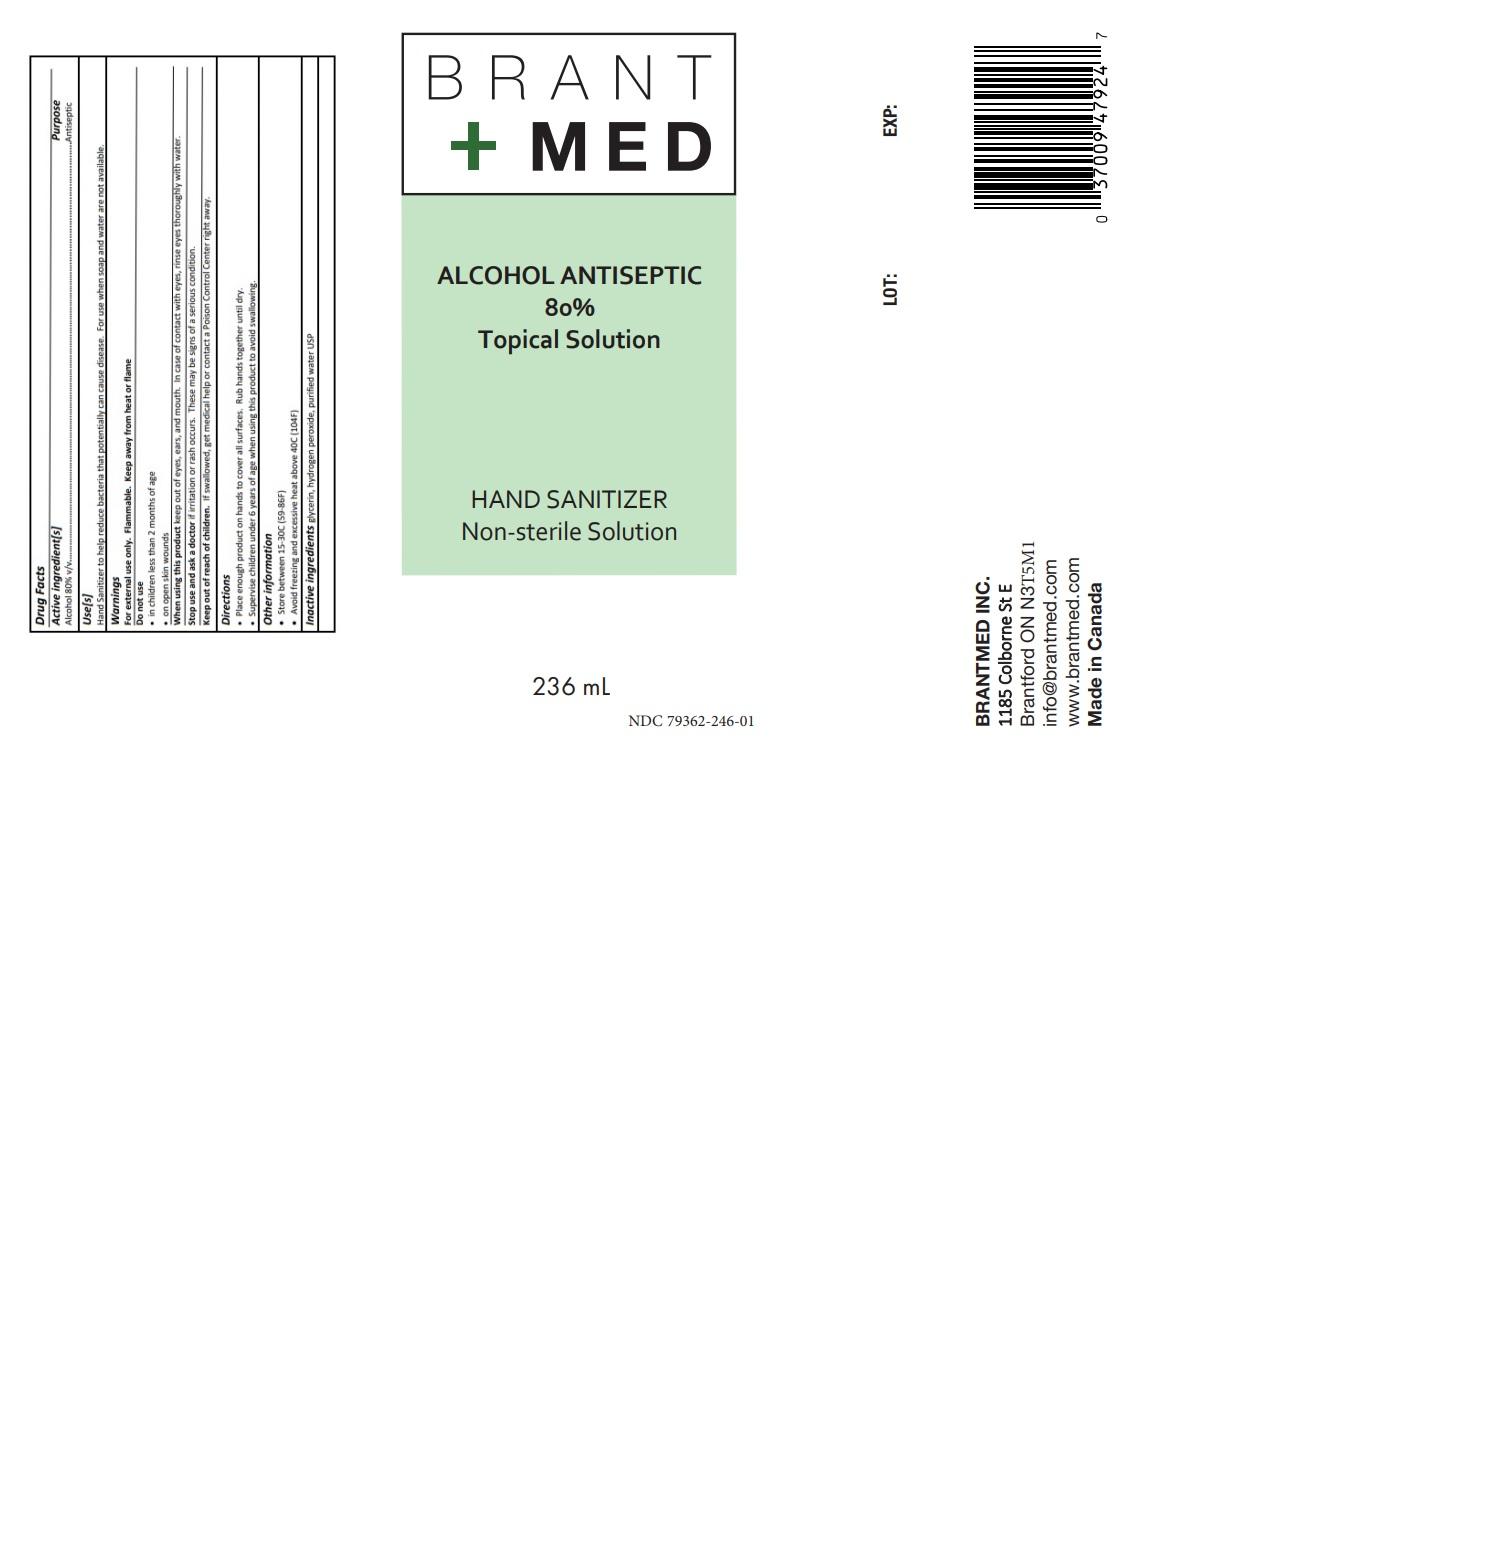 236 ml label